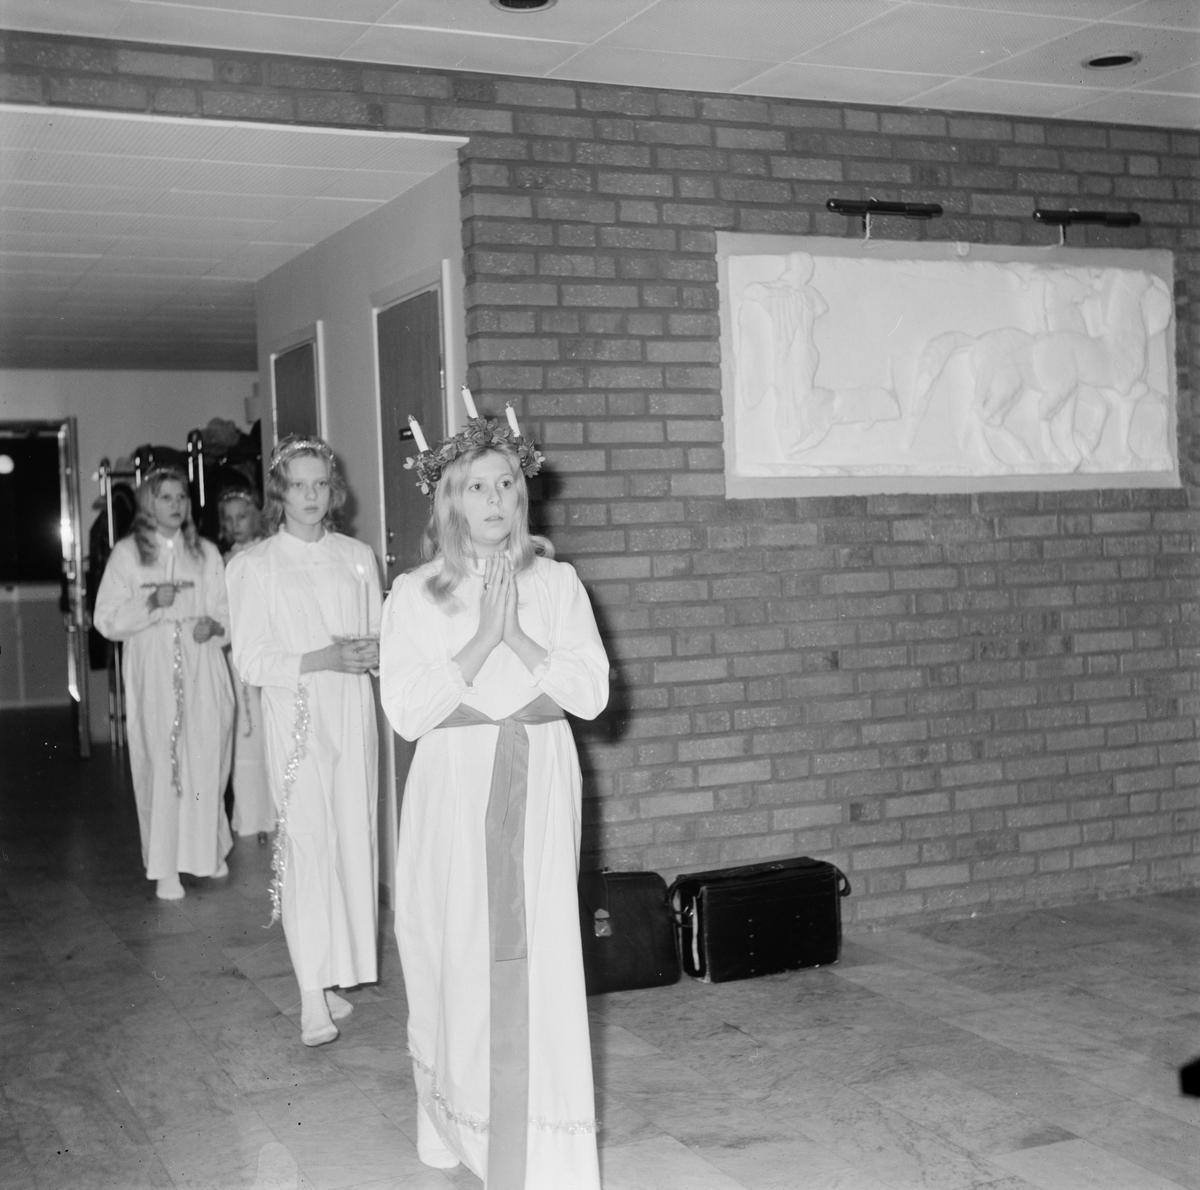 Elisabeth Eriksson, Kyrkbyns lucia årskurs 6, Uppland, december 1971